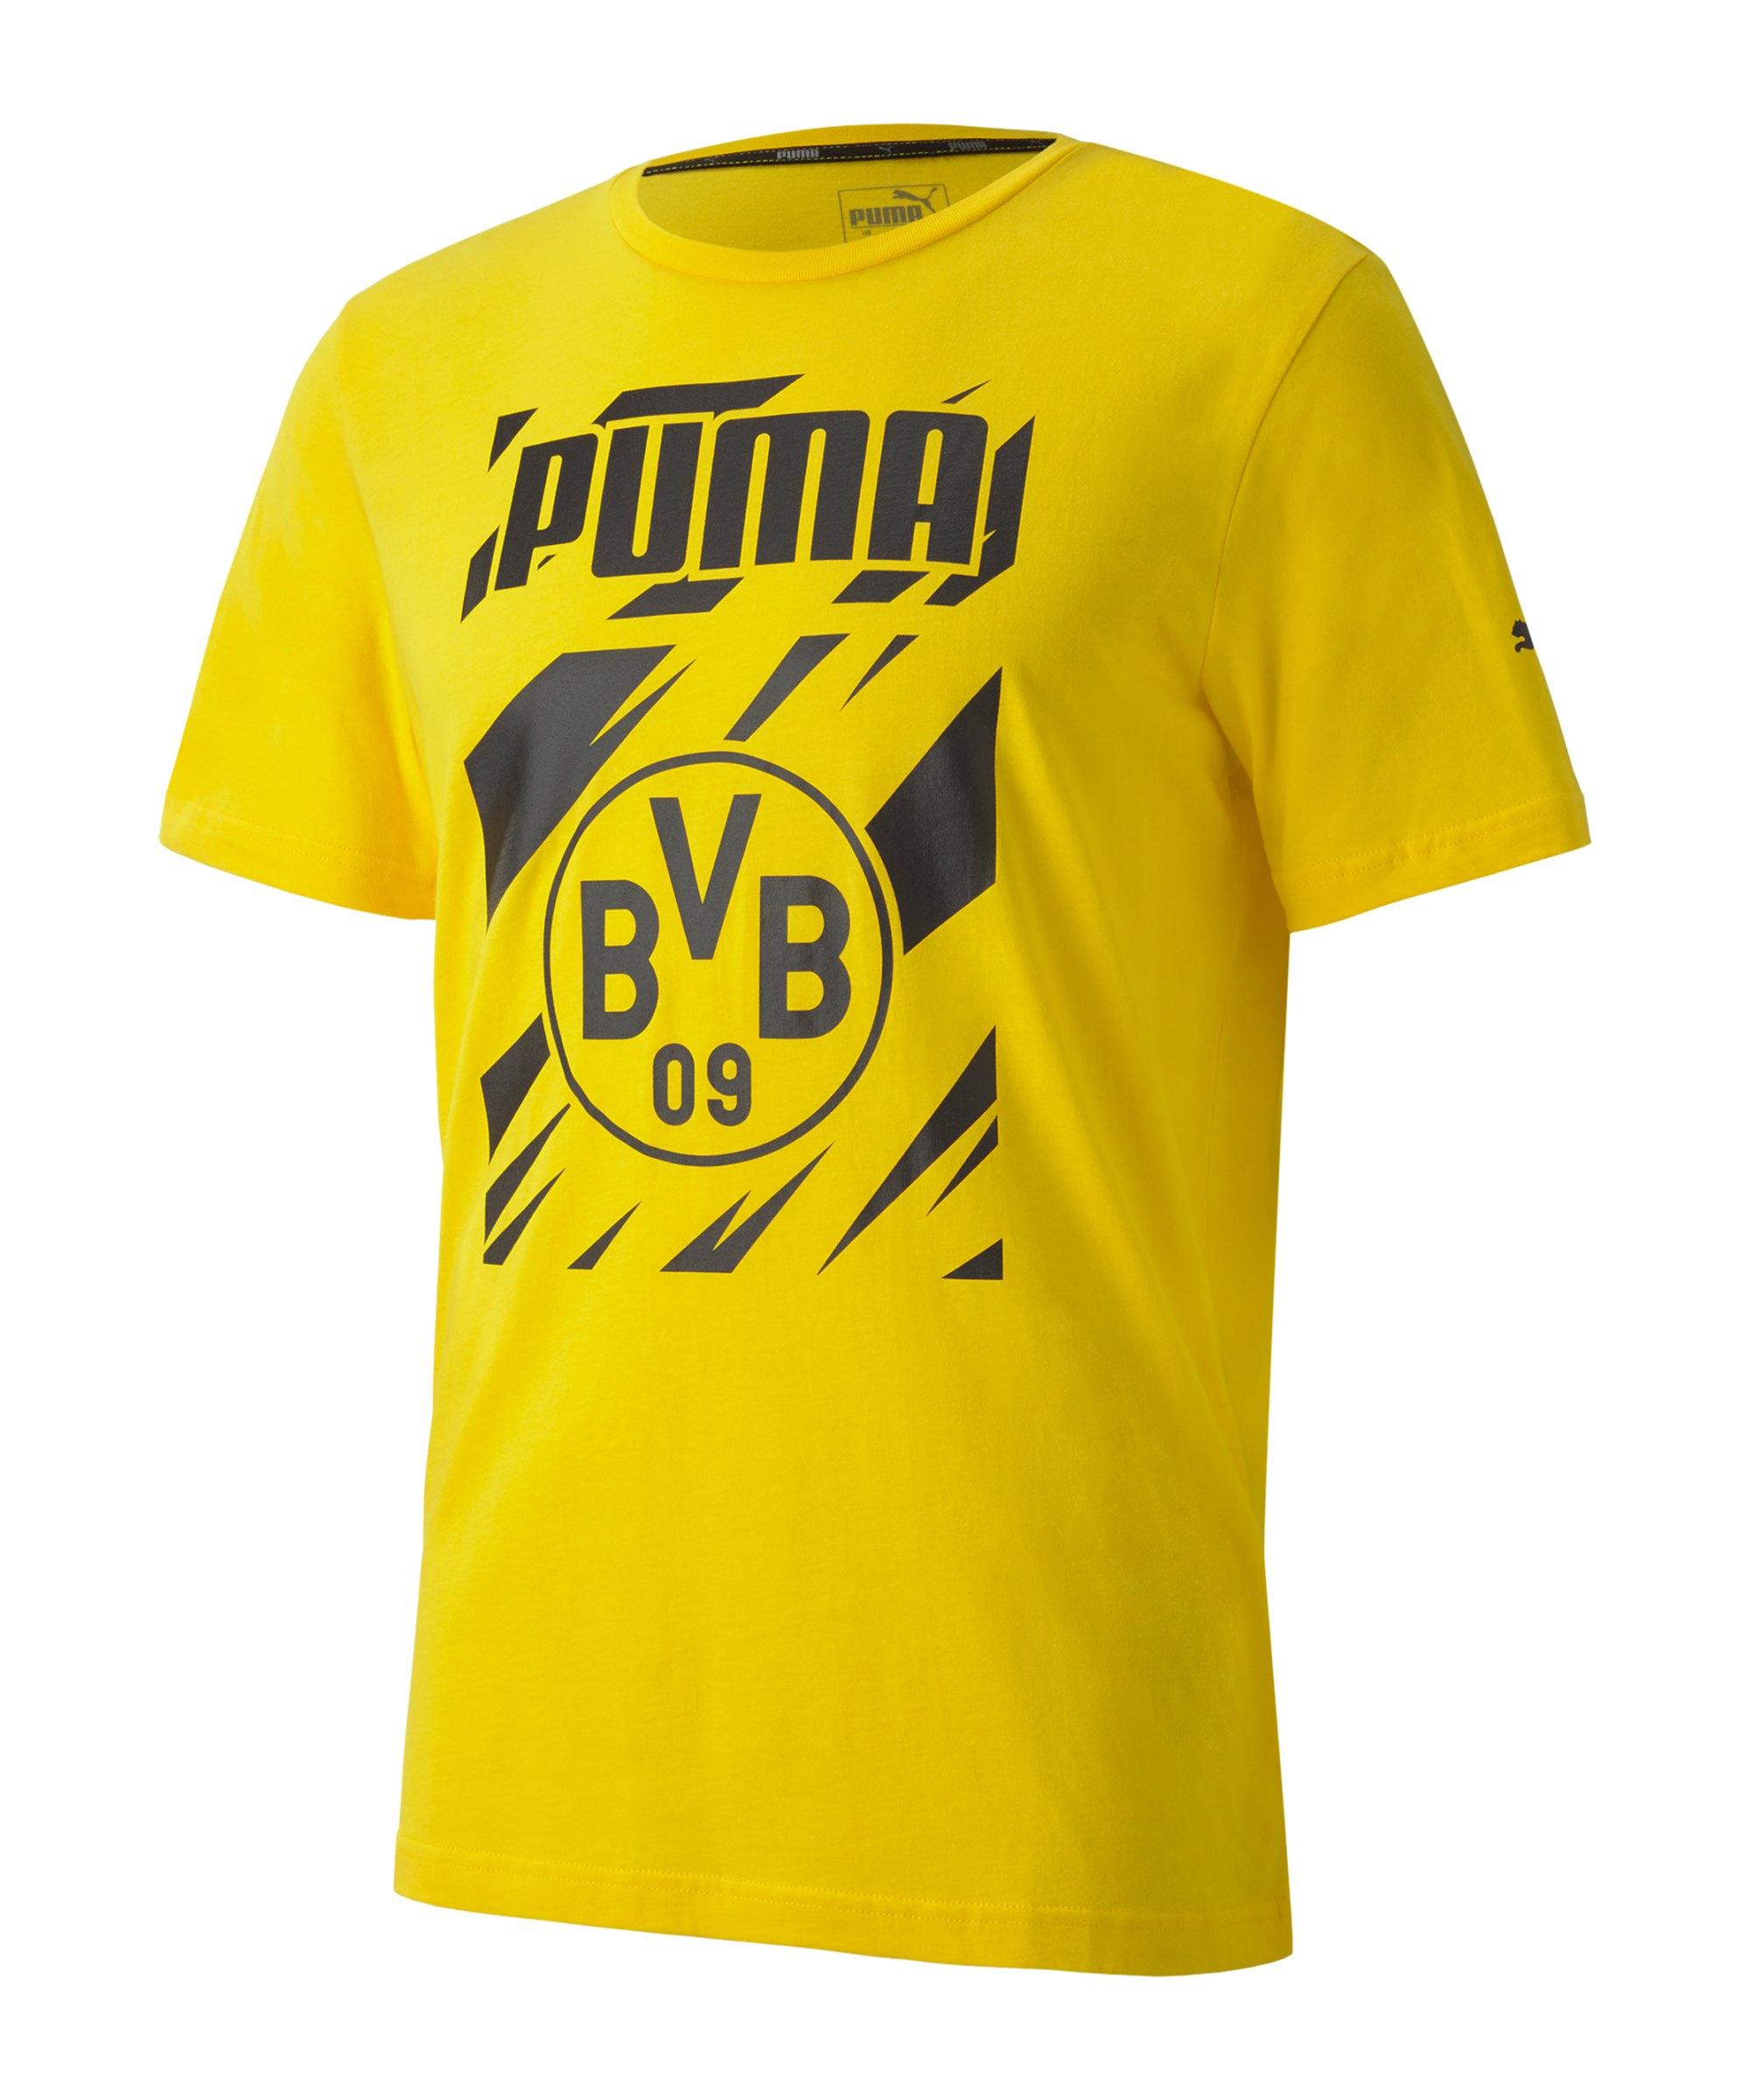 PUMA BVB Dortmund ftblCore Graphic T-Shirt Gelb F01 - gelb